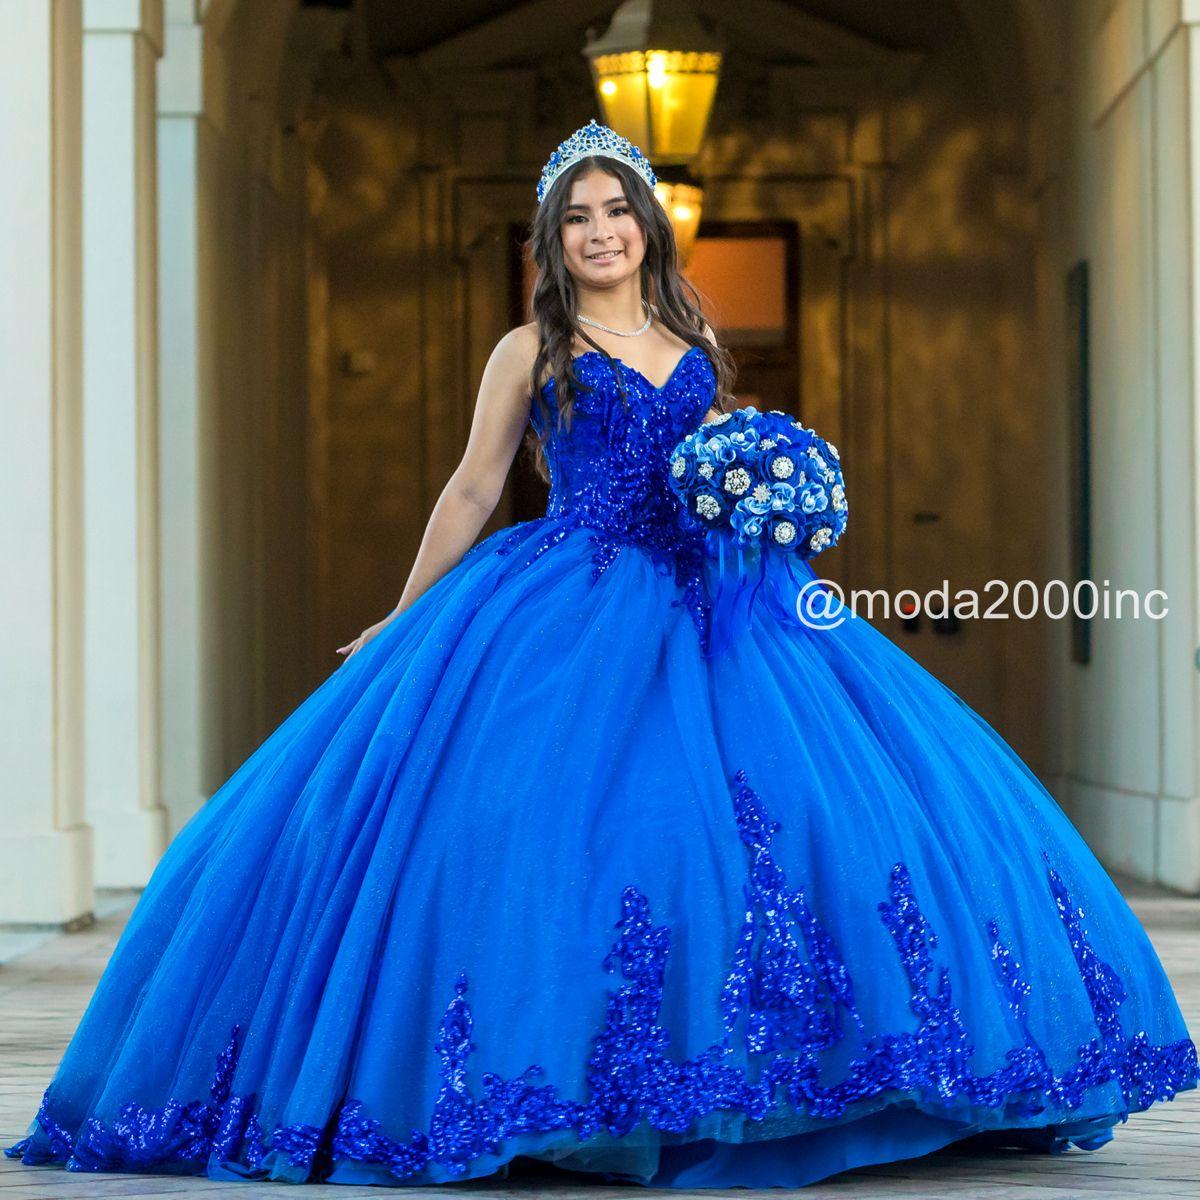 37+ Royal blue quinceanera dresses ideas info